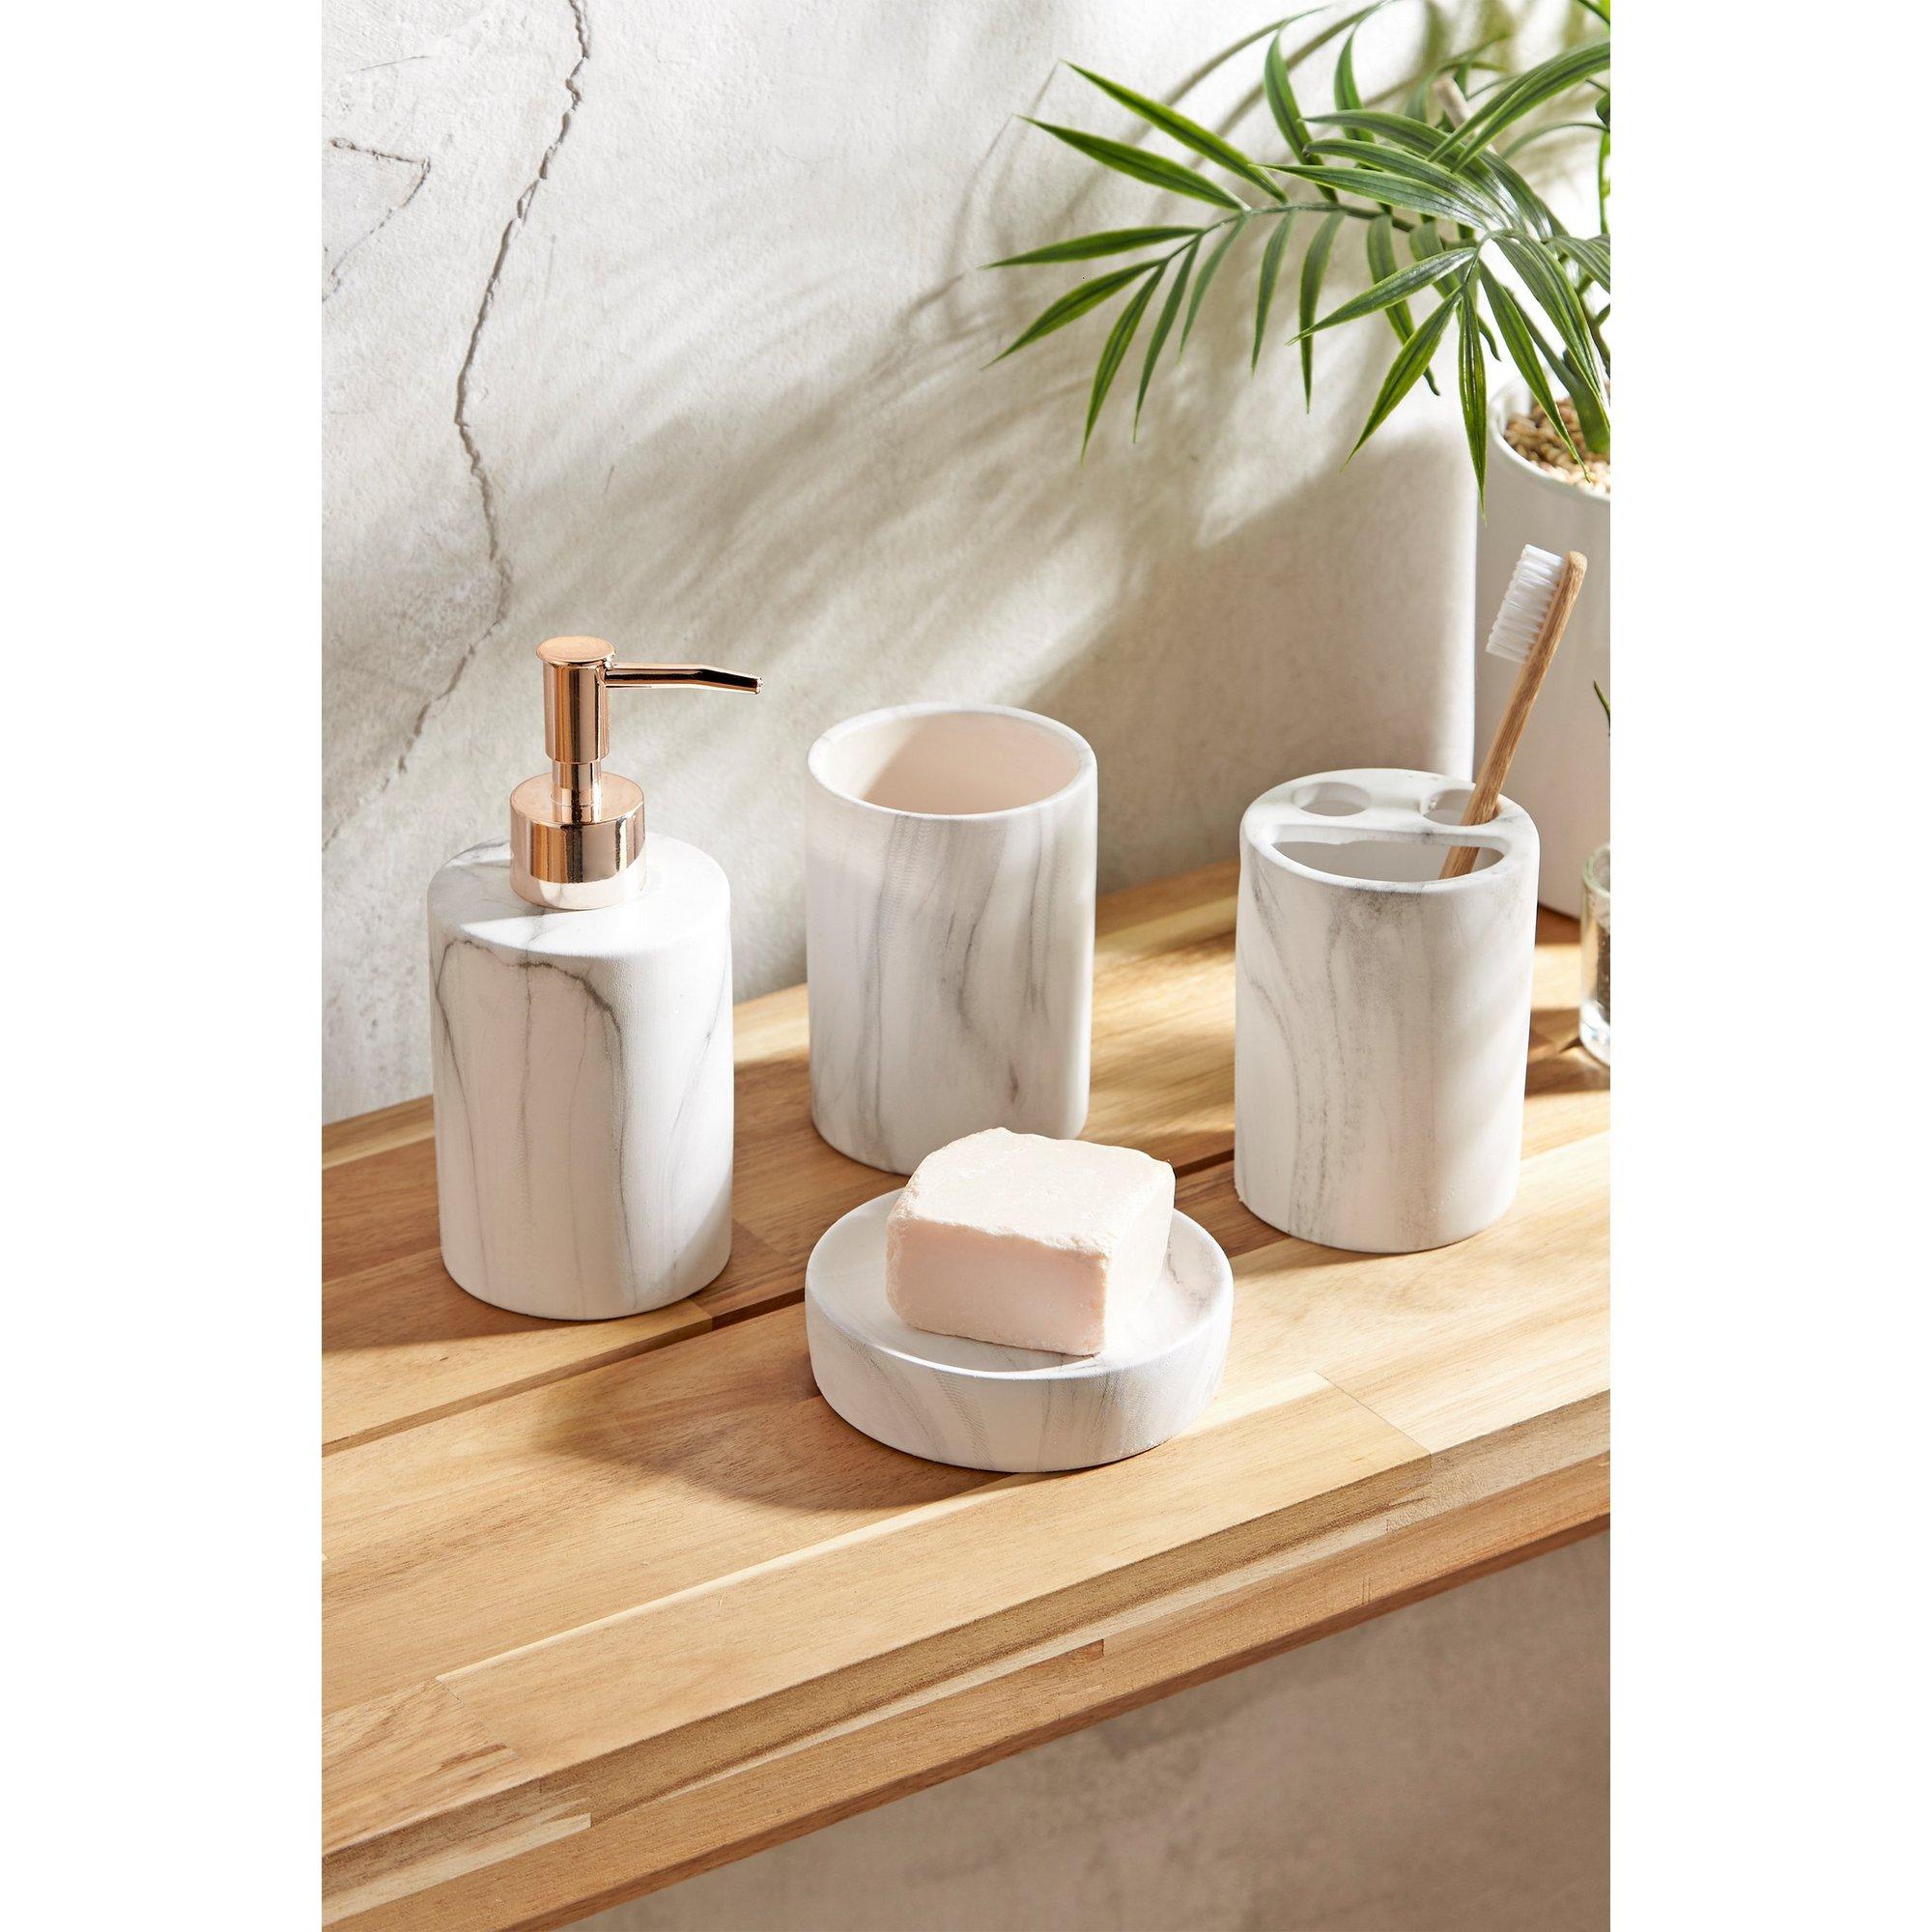 Image of 4-Piece Marble Bathroom Set